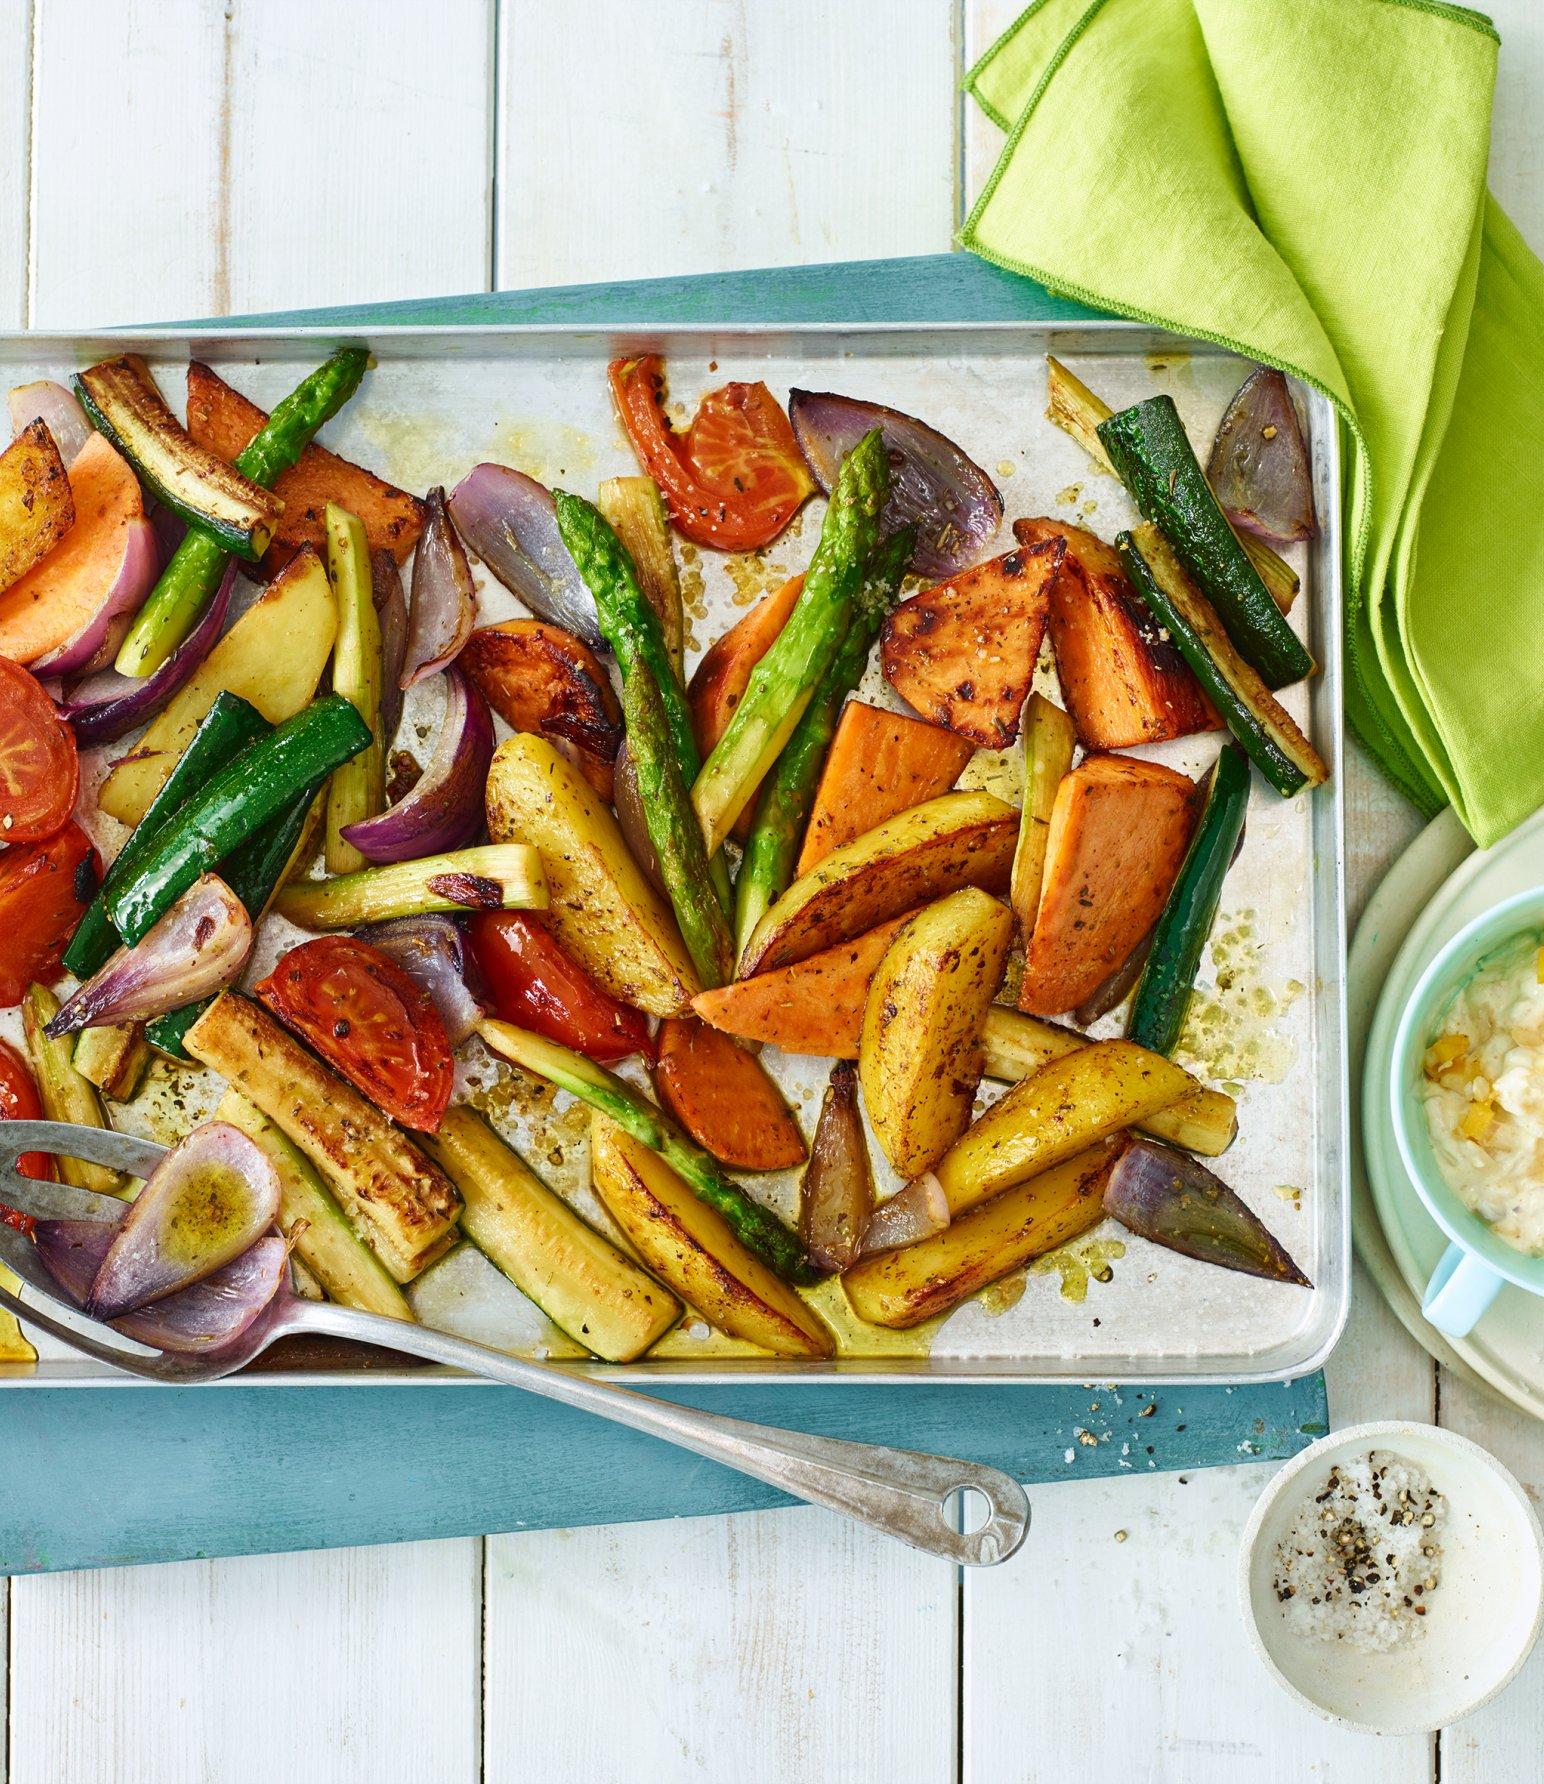 Frühlings-Ofengemüse mit Currydip